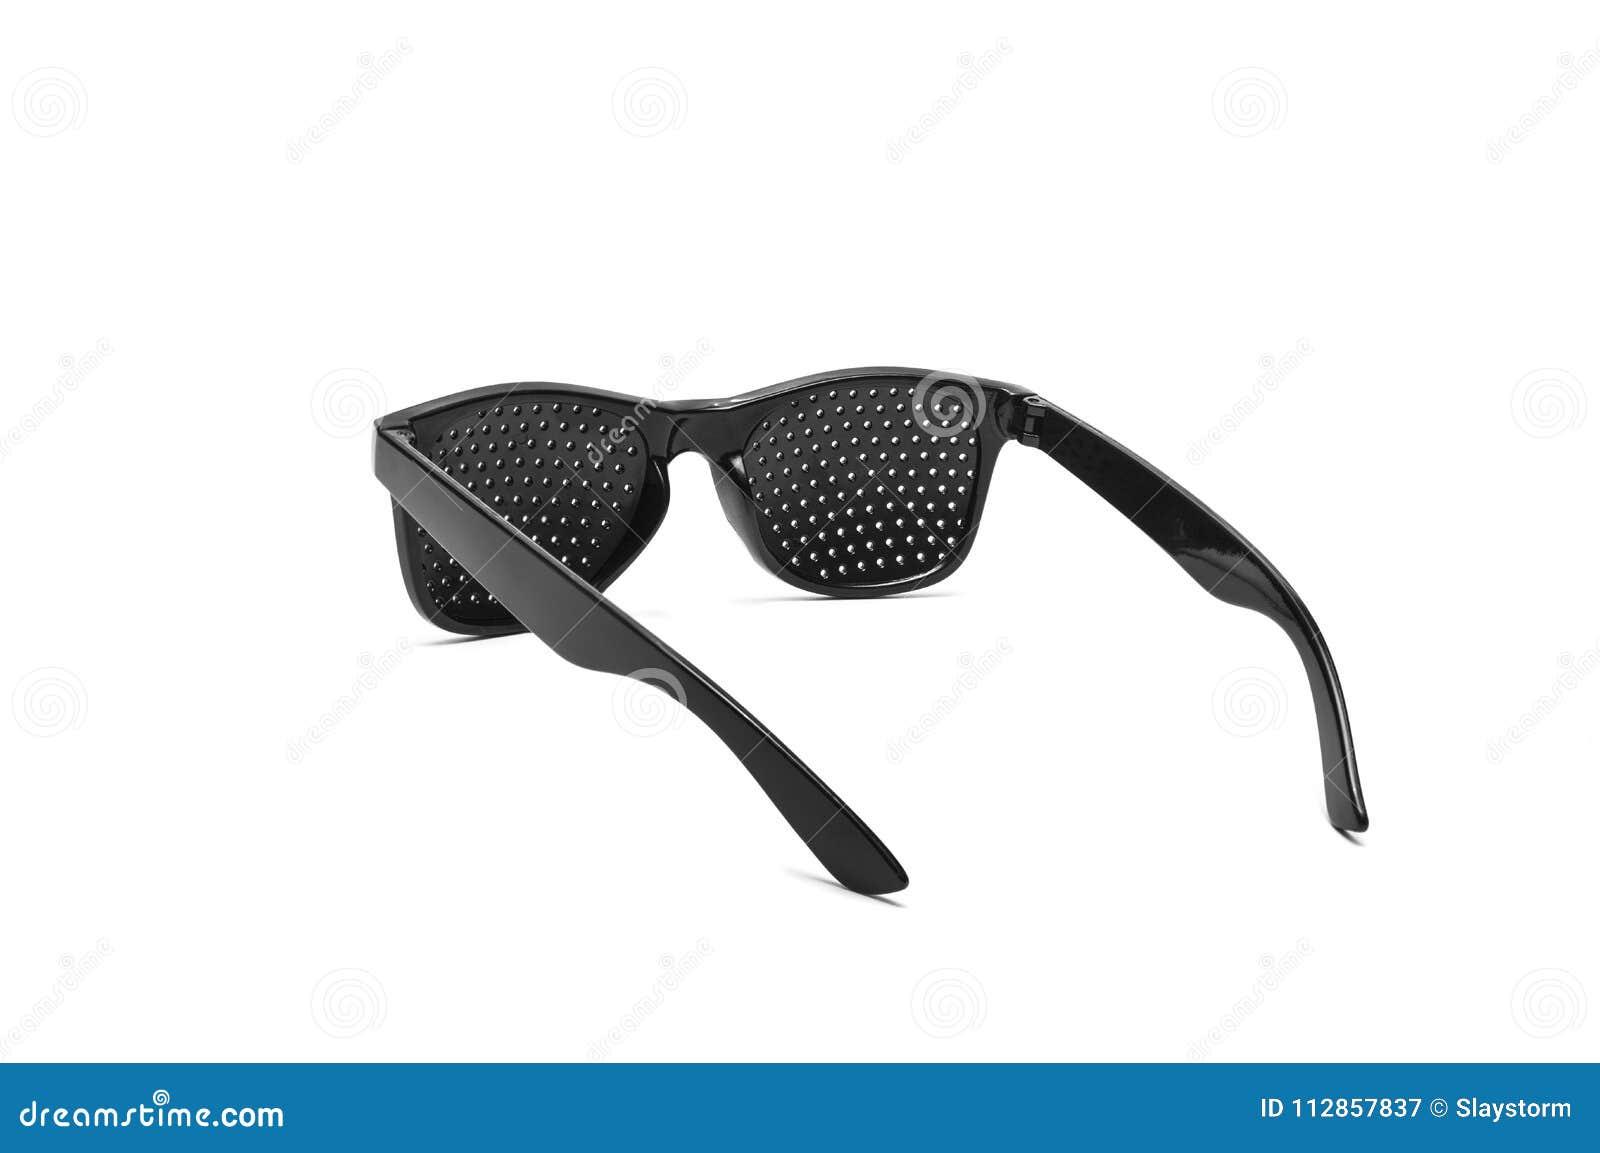 de1bd22c0d Γυαλιά ηλίου τρυπών καρφιτσών Αντι γυαλιά μυωπίας για τη διόρθωση οράματος